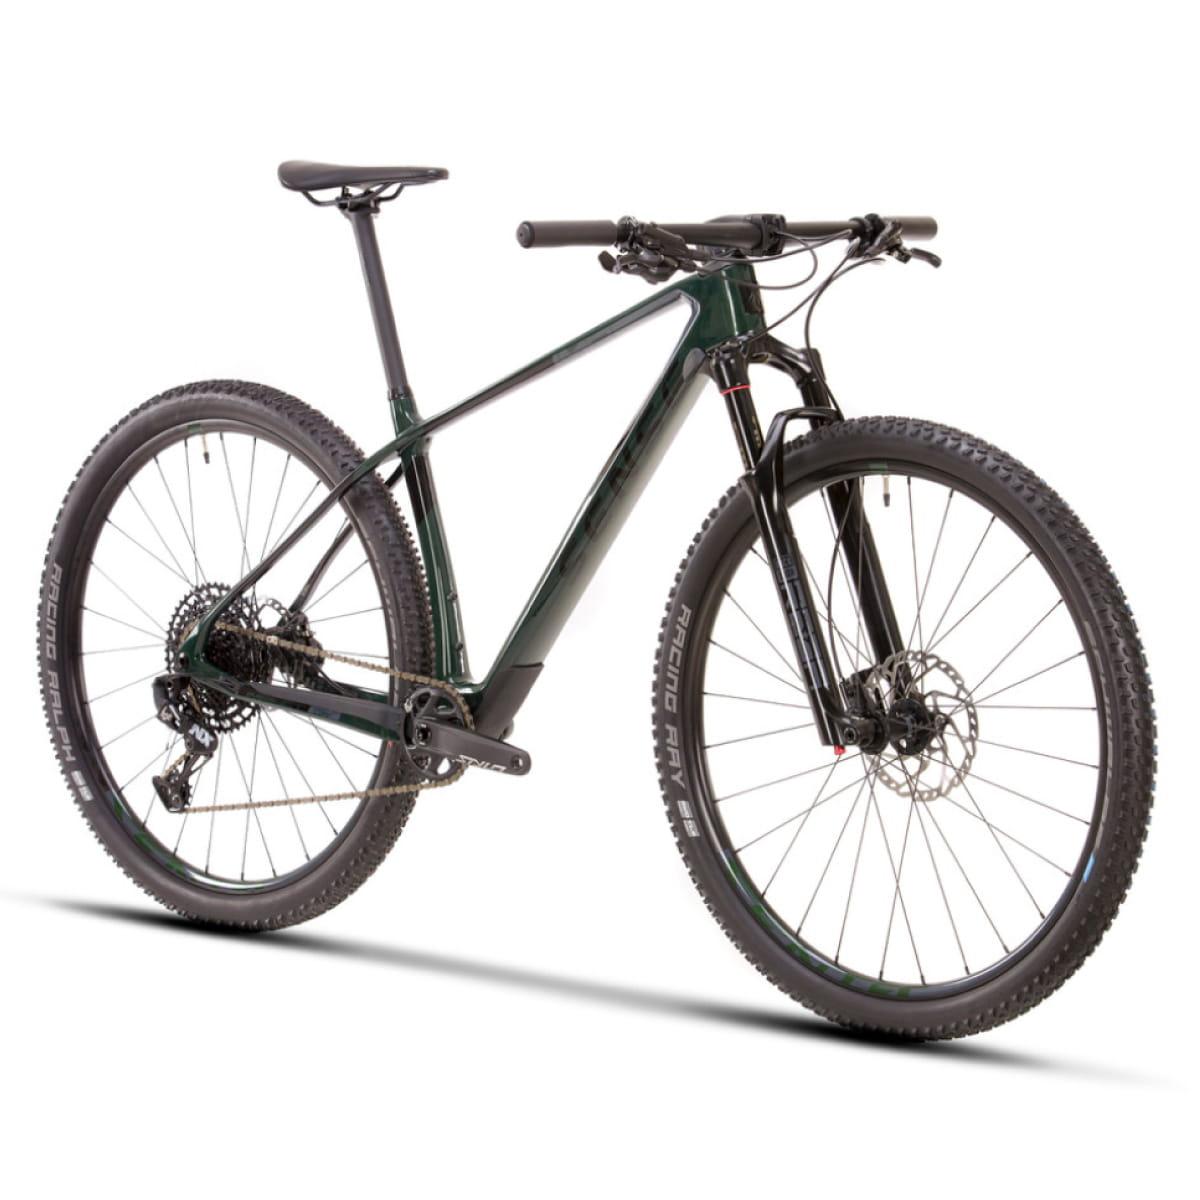 Bike Sense Impact Carbon Comp 2021 Sram Eagle NX 12V Verde e Cinza